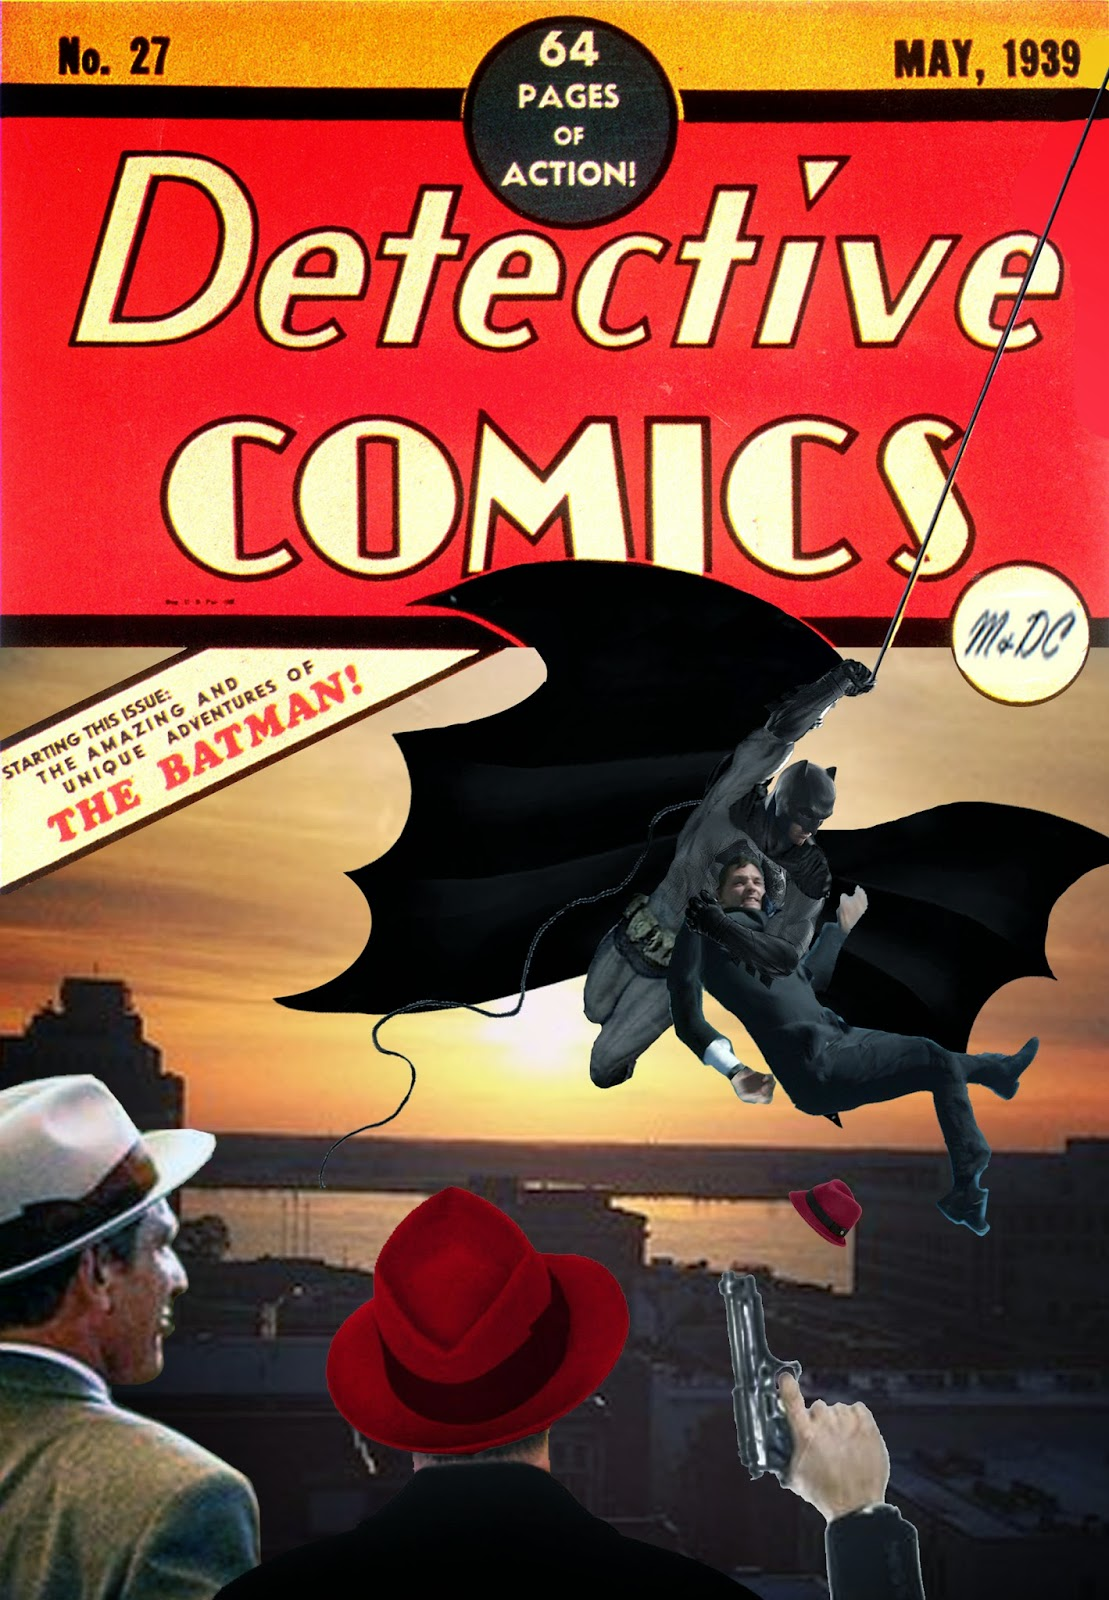 http://4.bp.blogspot.com/-IYc_rQuPWvY/VAtarA5264I/AAAAAAAABxM/3MABt8sjsNU/s1600/detective_comics__27__the_caped_crusader_by_fmirza95-d7xzlwa.jpg